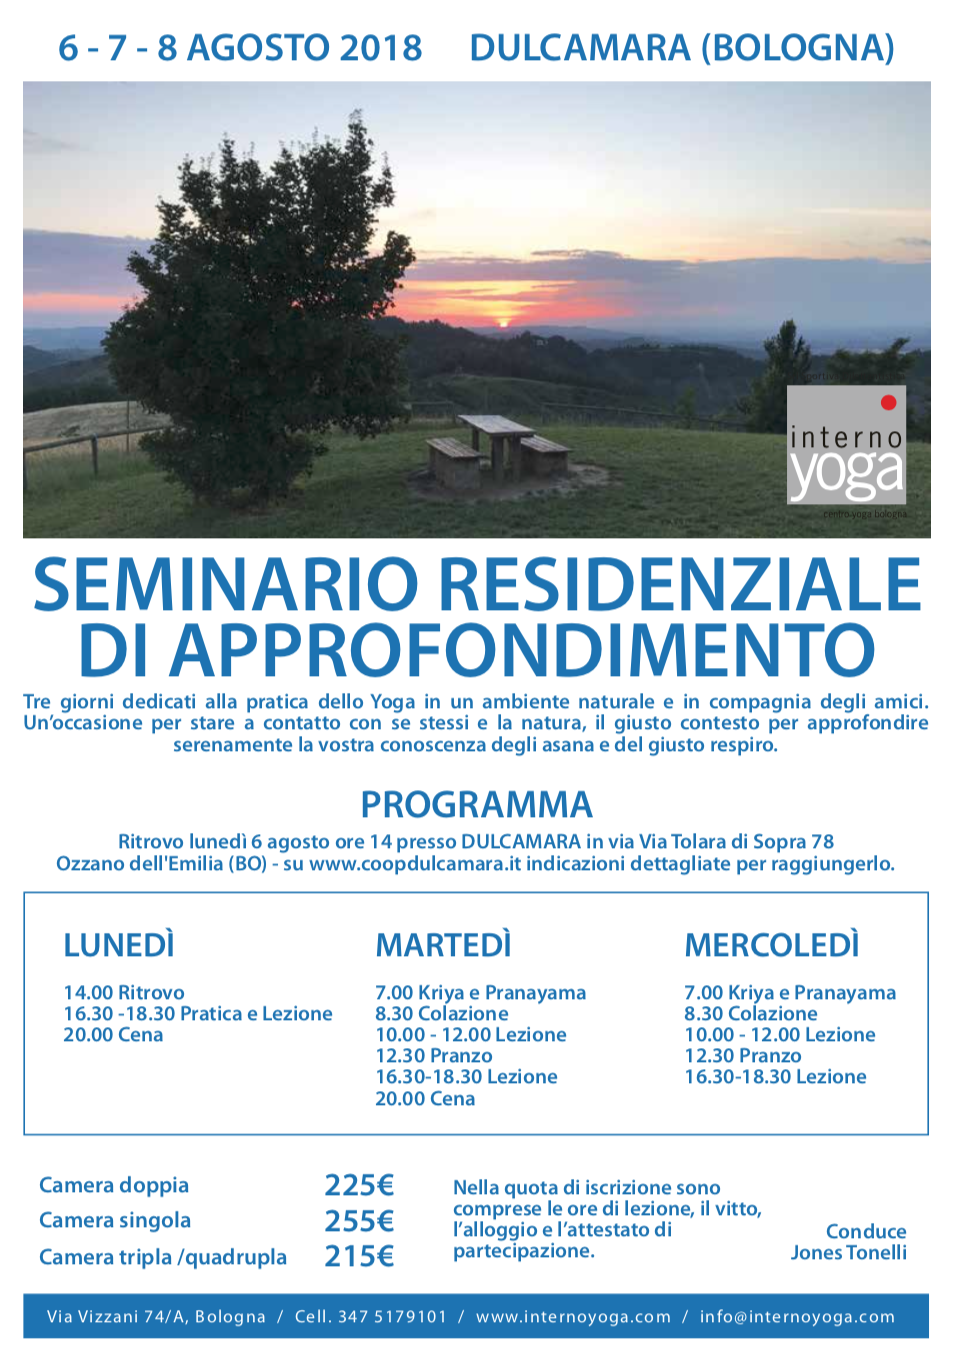 seminario-residenziale-internoyoga-2018